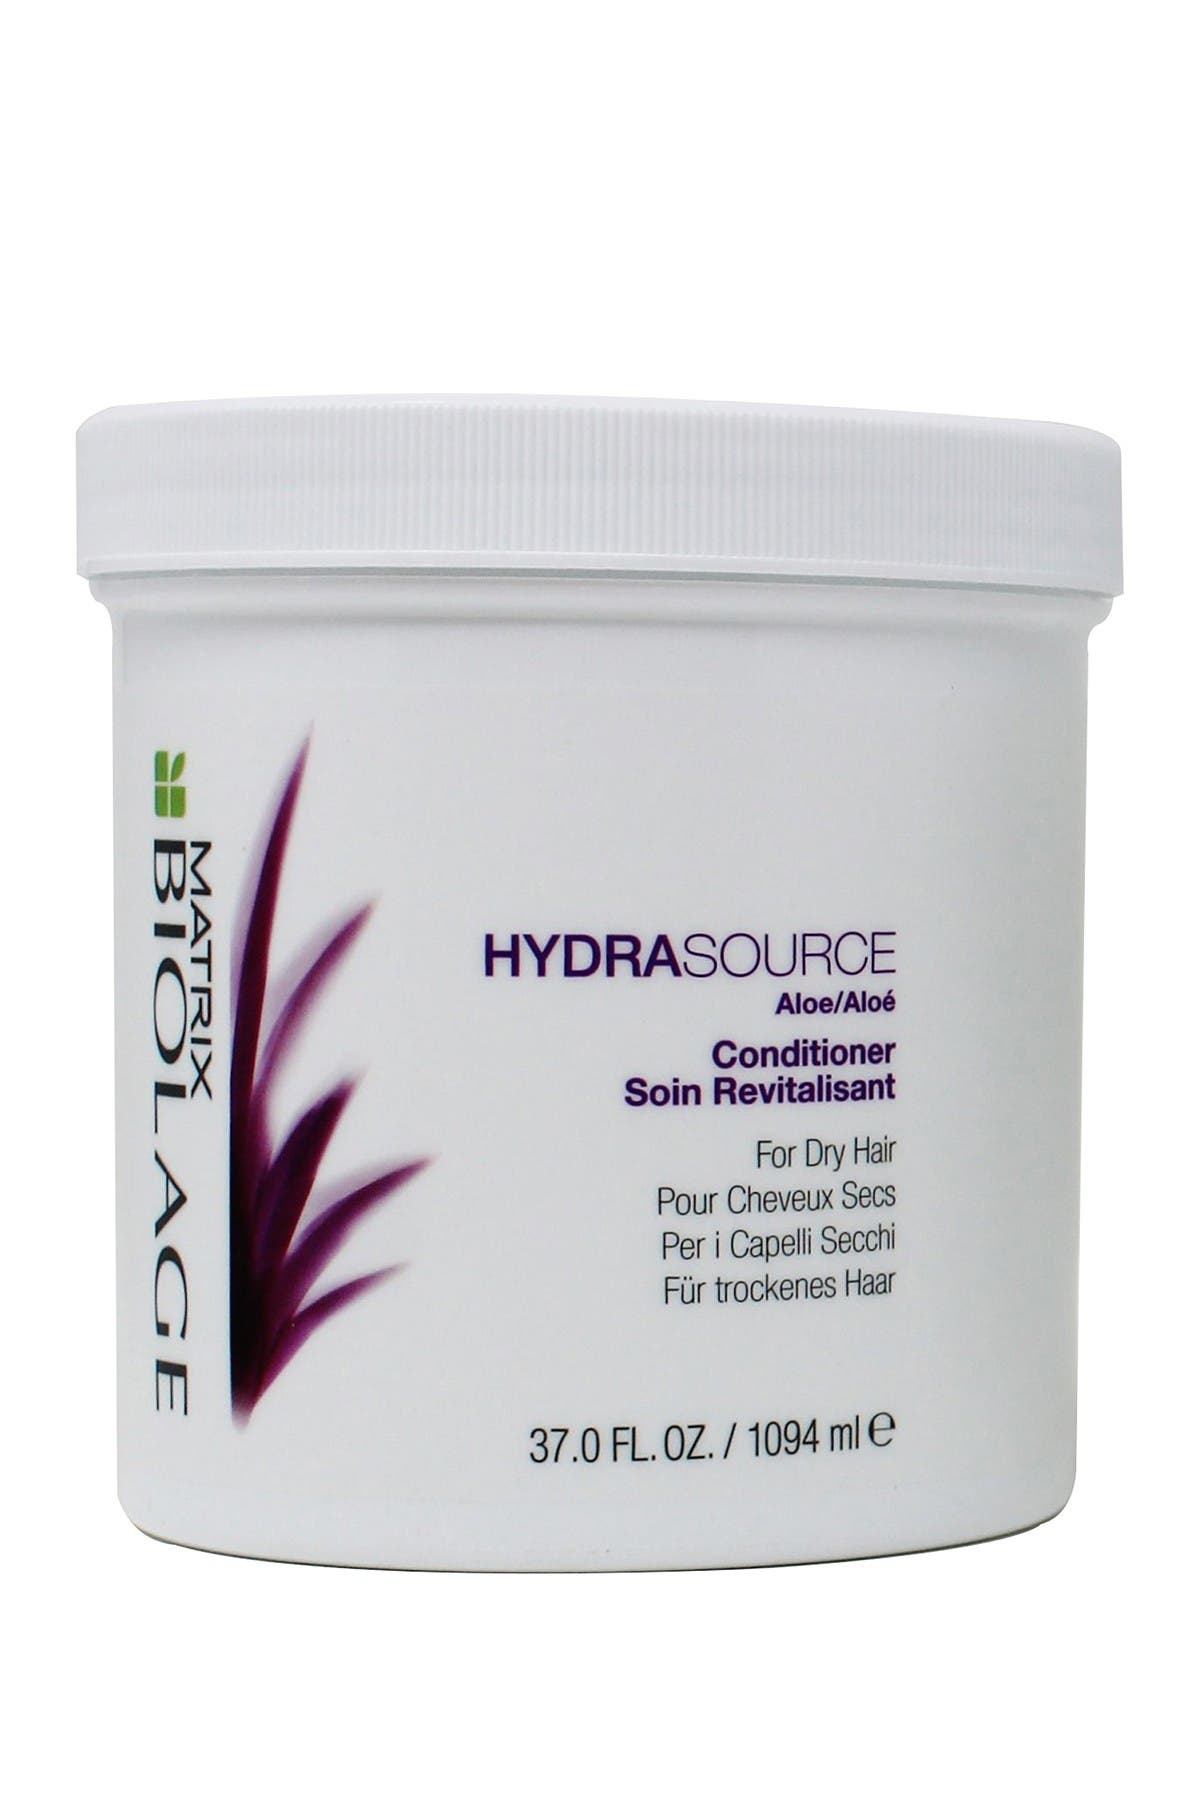 Image of BIOLAGE Hydrasource Conditioner Jar - 37 oz.